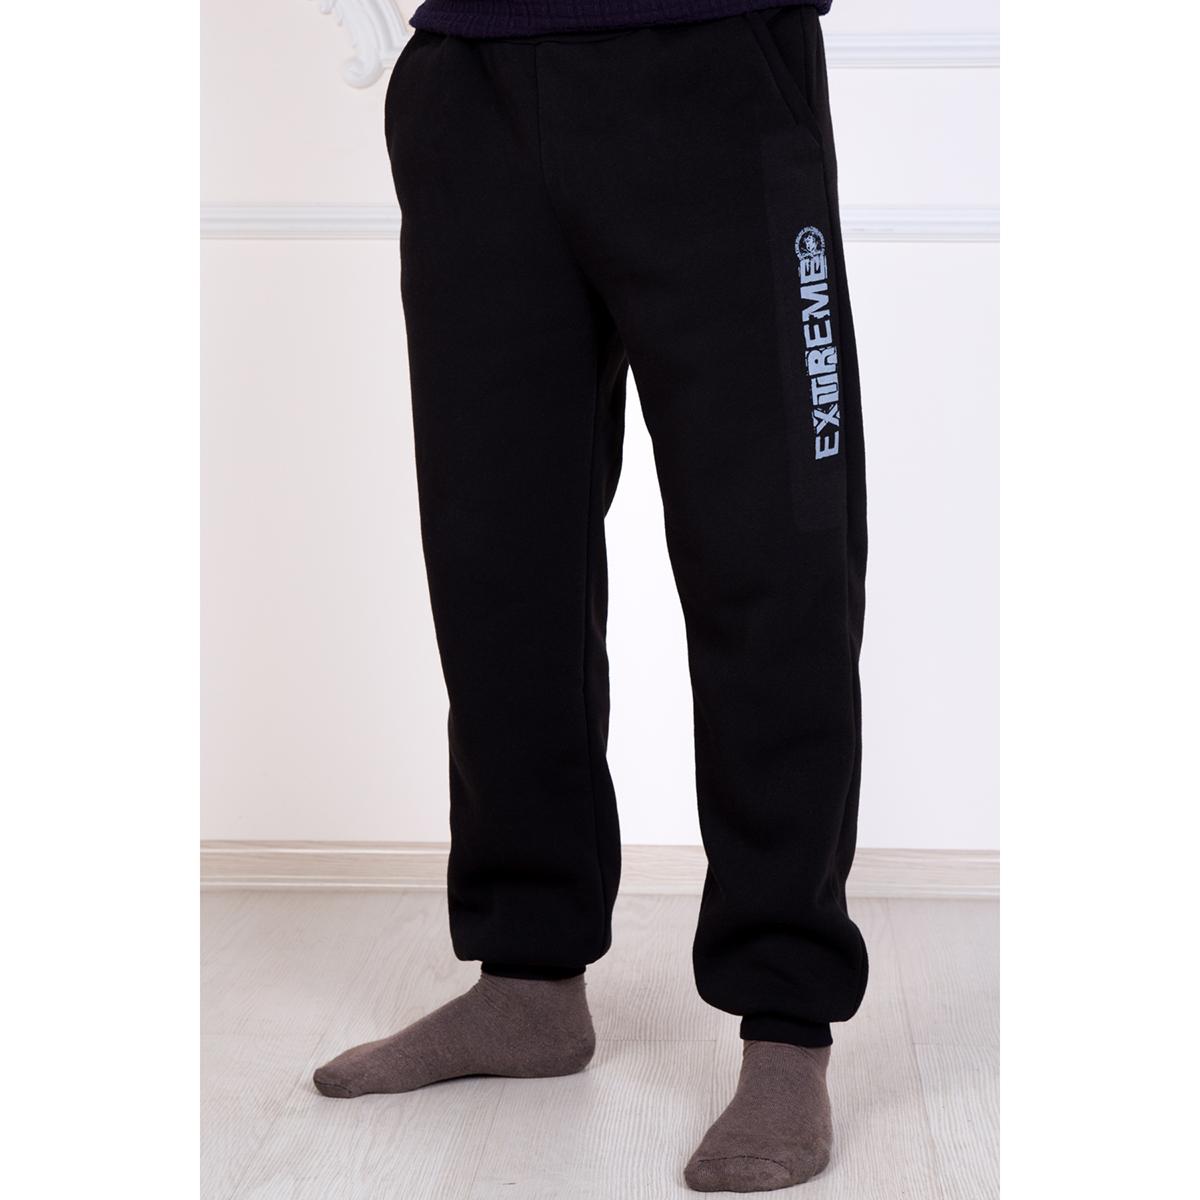 Мужские брюки  Экстрим , размер 60 - Мужская одежда артикул: 22511